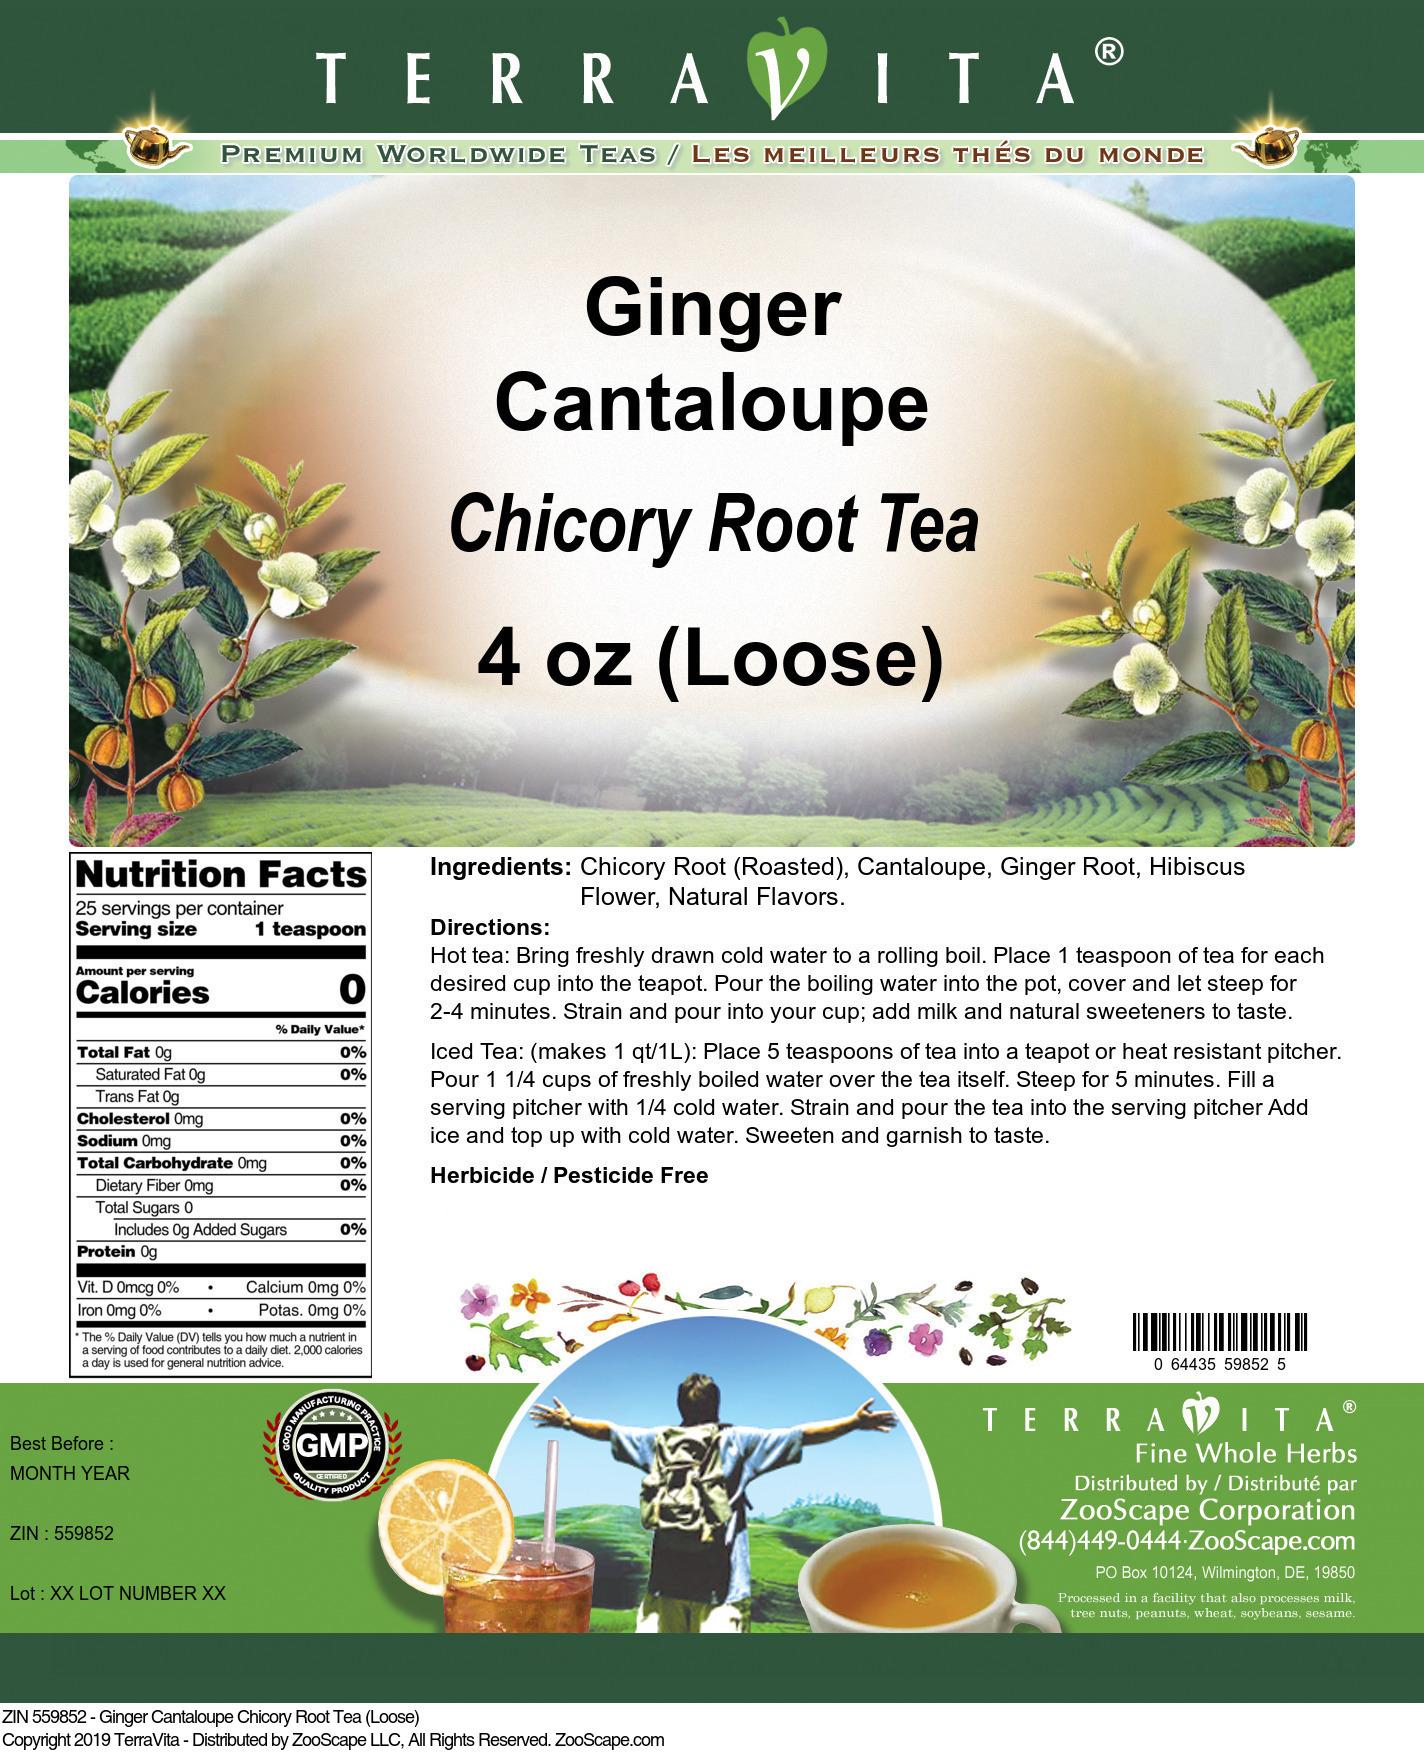 Ginger Cantaloupe Chicory Root